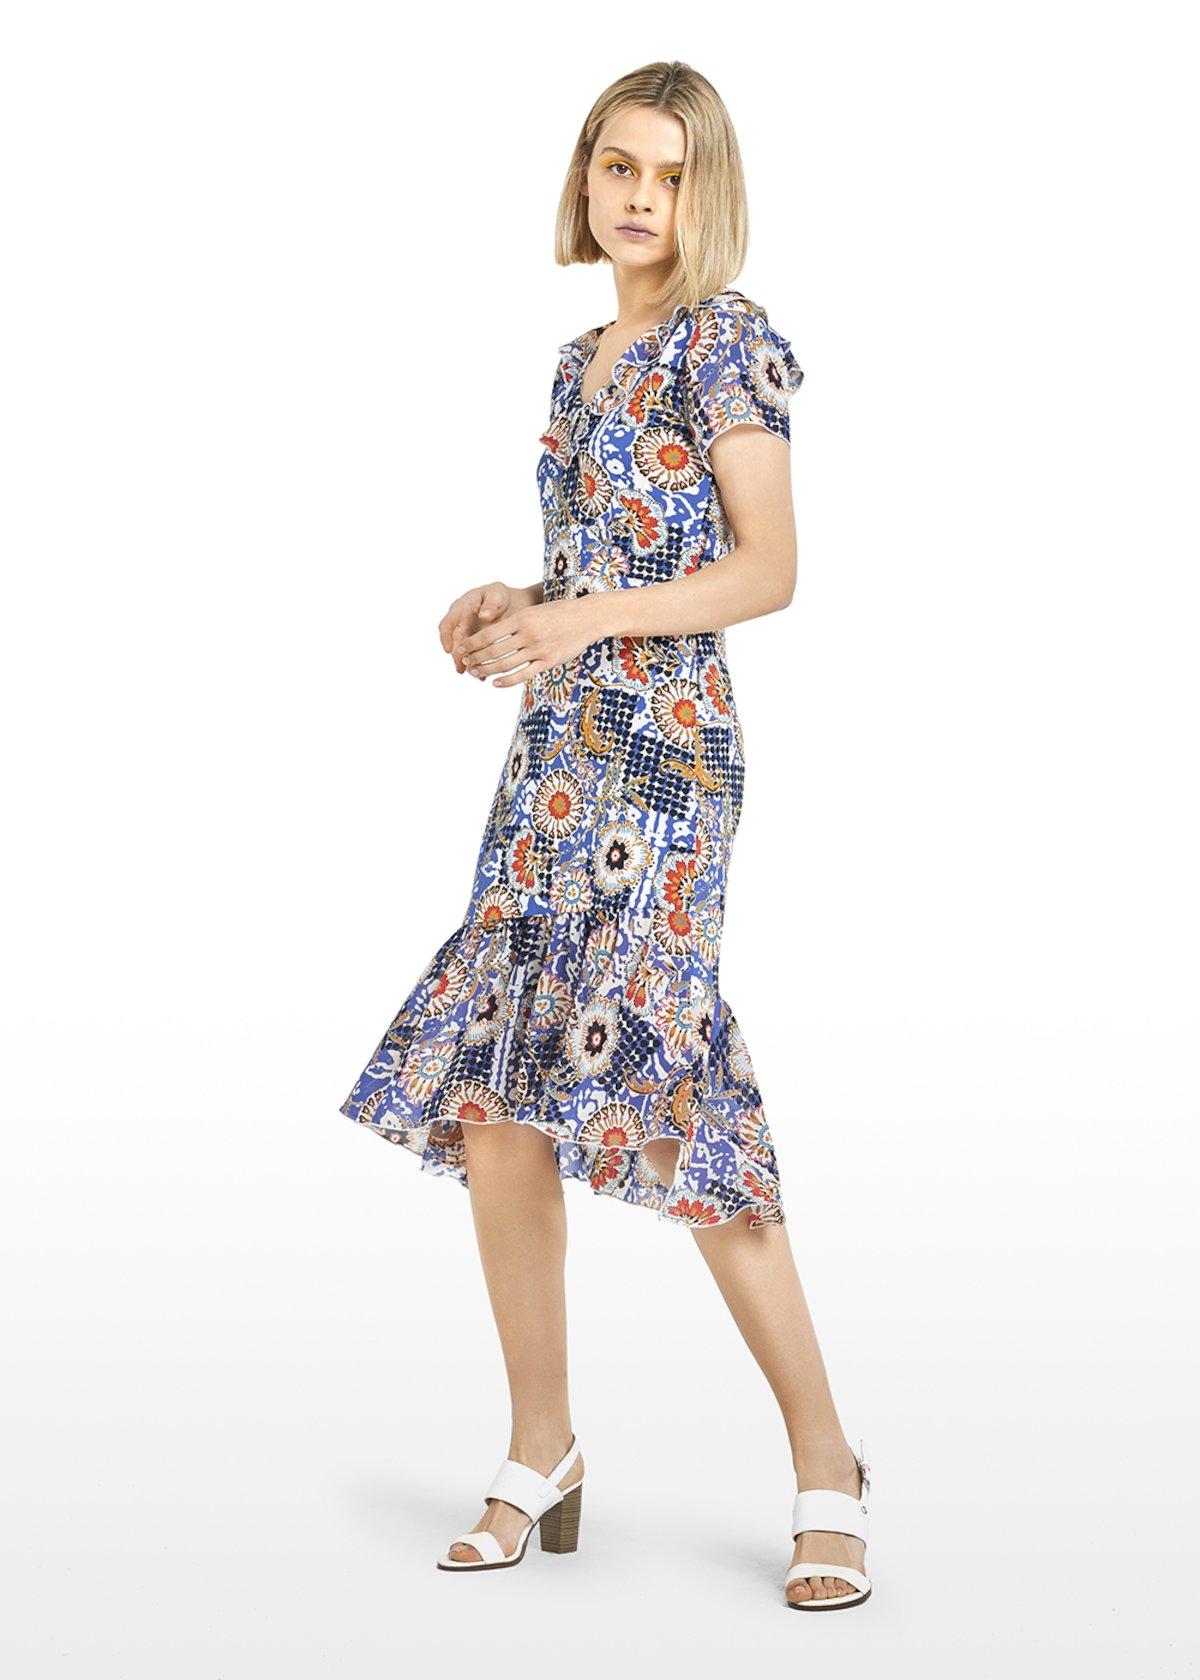 Alvin Short sleeve dress Ankara print - Avion / White Fantasia - Woman - Category image